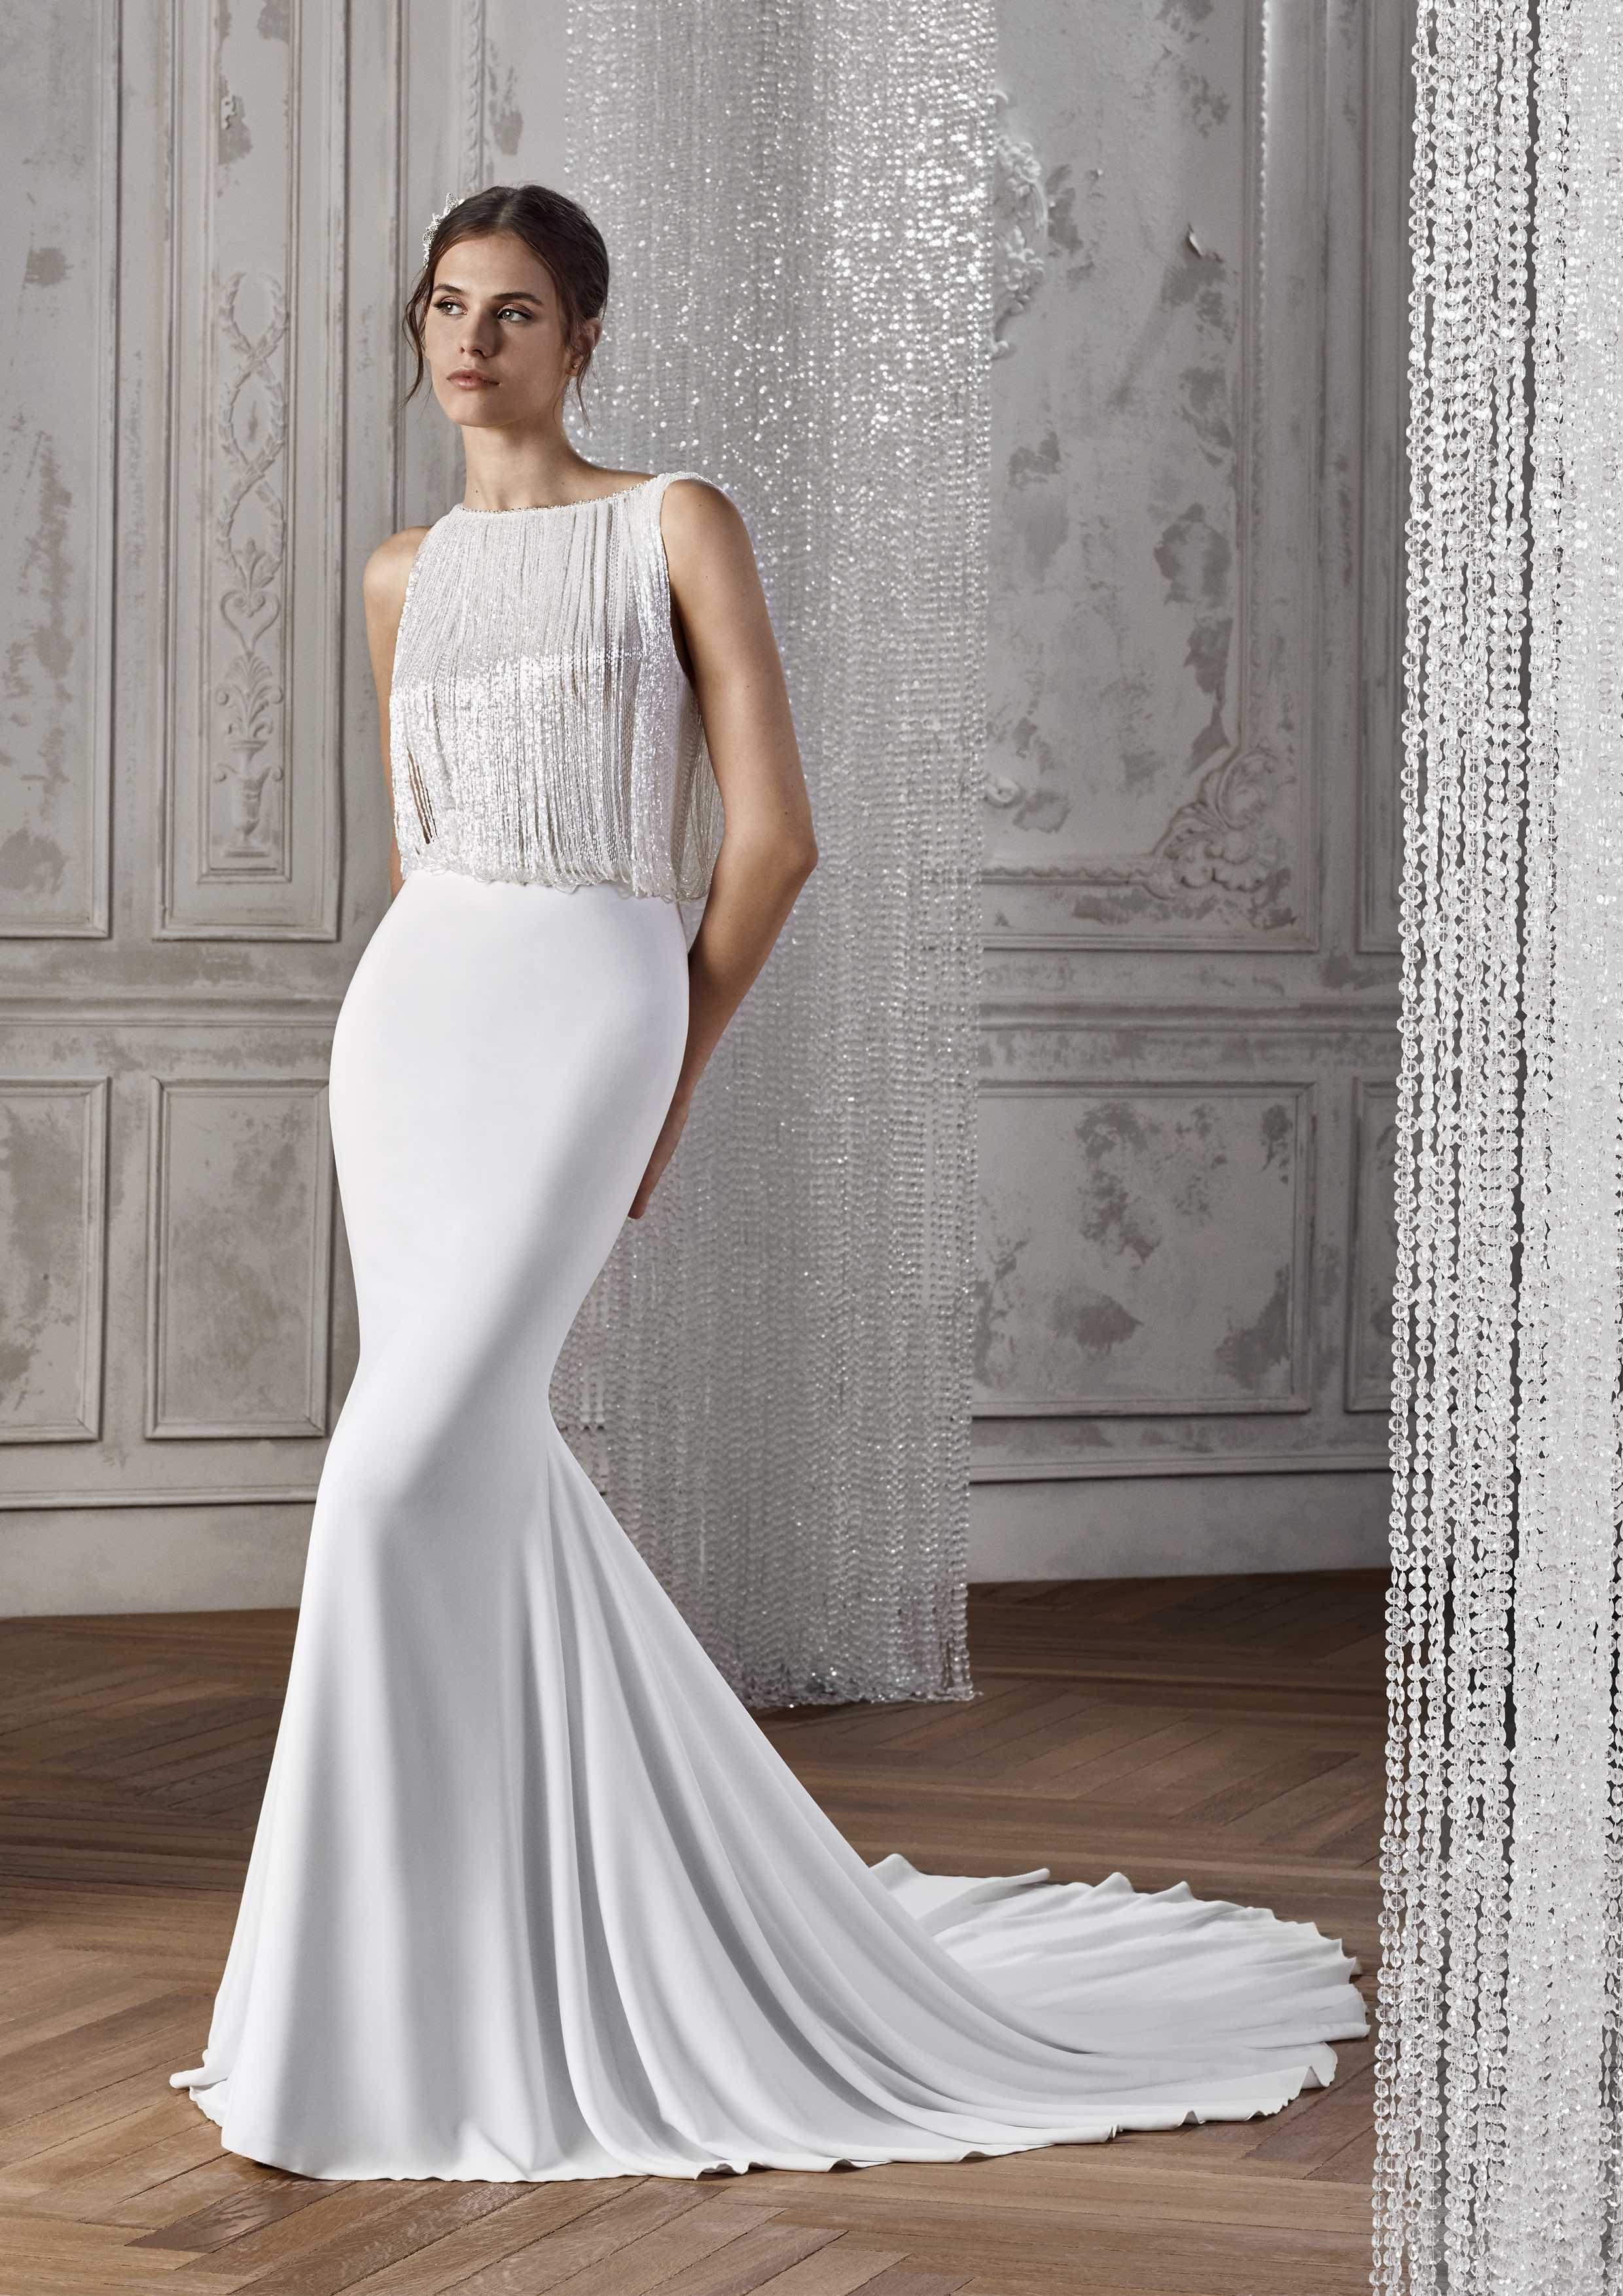 8ba34f18d055 KAREL ST PATRICK STUDIO 2019 OFF WHITE WEDDING DRESS LUV BRIDAL AUSTRALIA